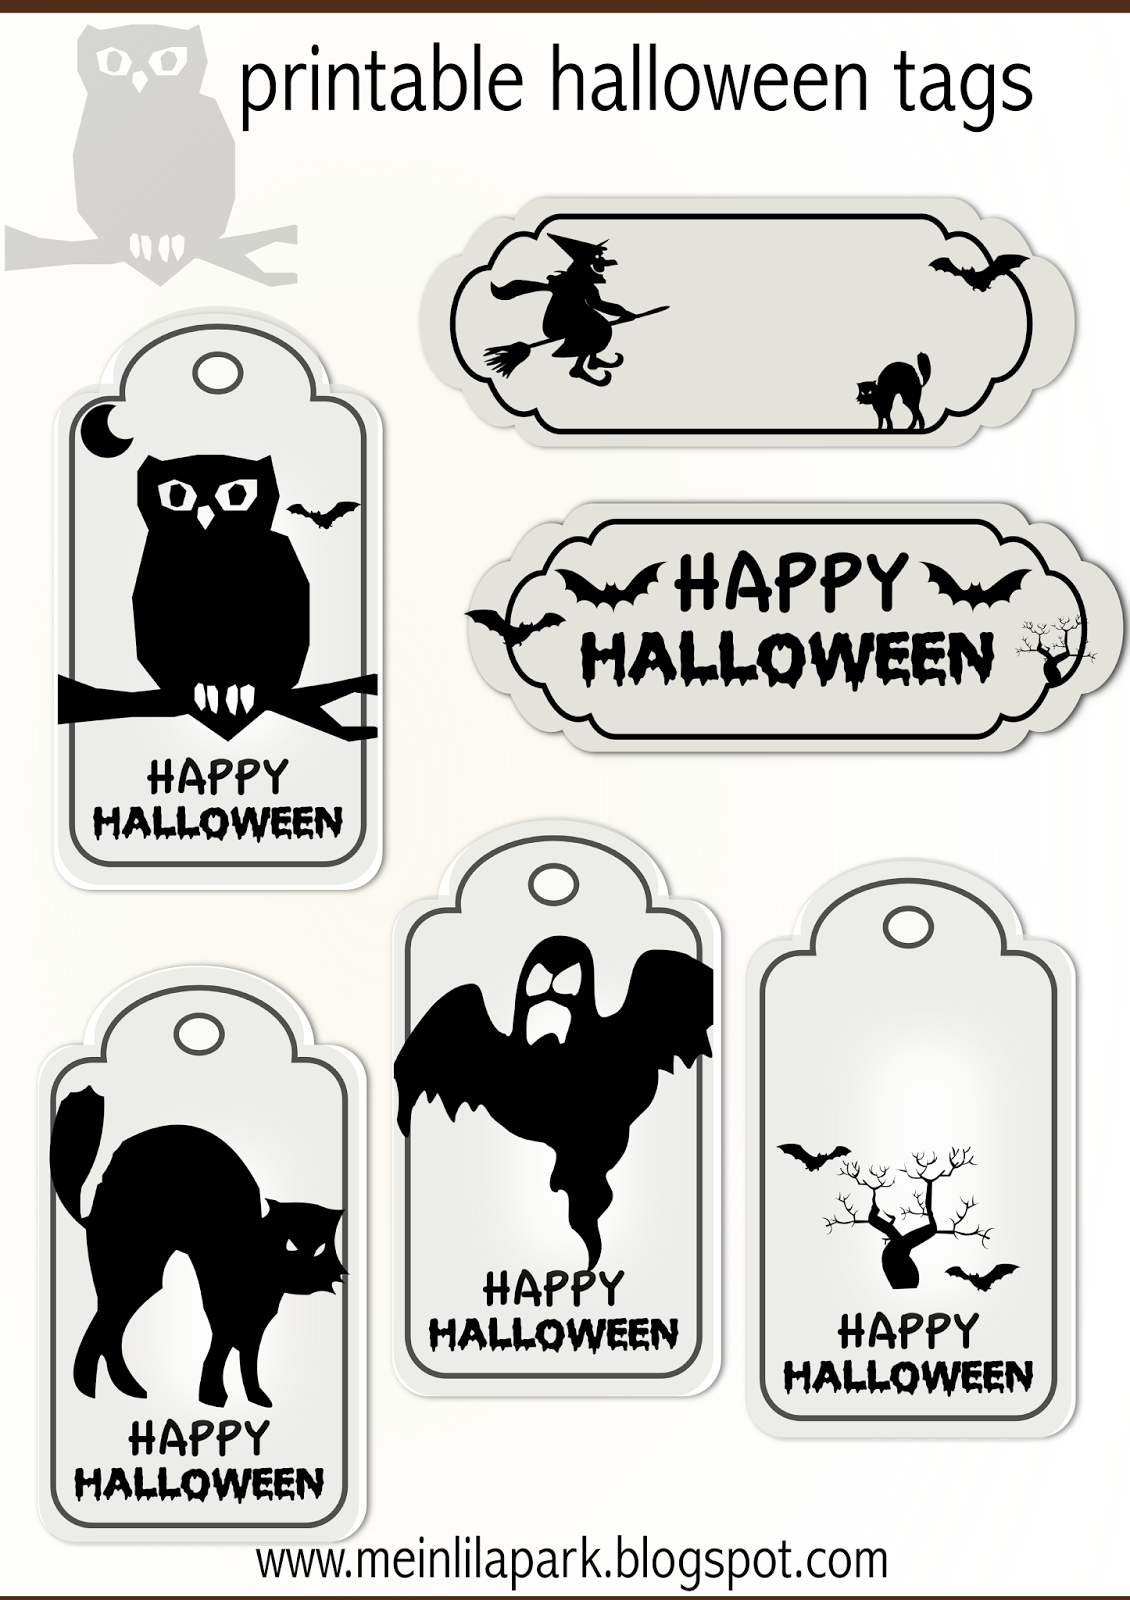 Free Printable Halloween Tags - Druckvorlage Halloween - Freebie - Free Printable Goodie Bag Tags